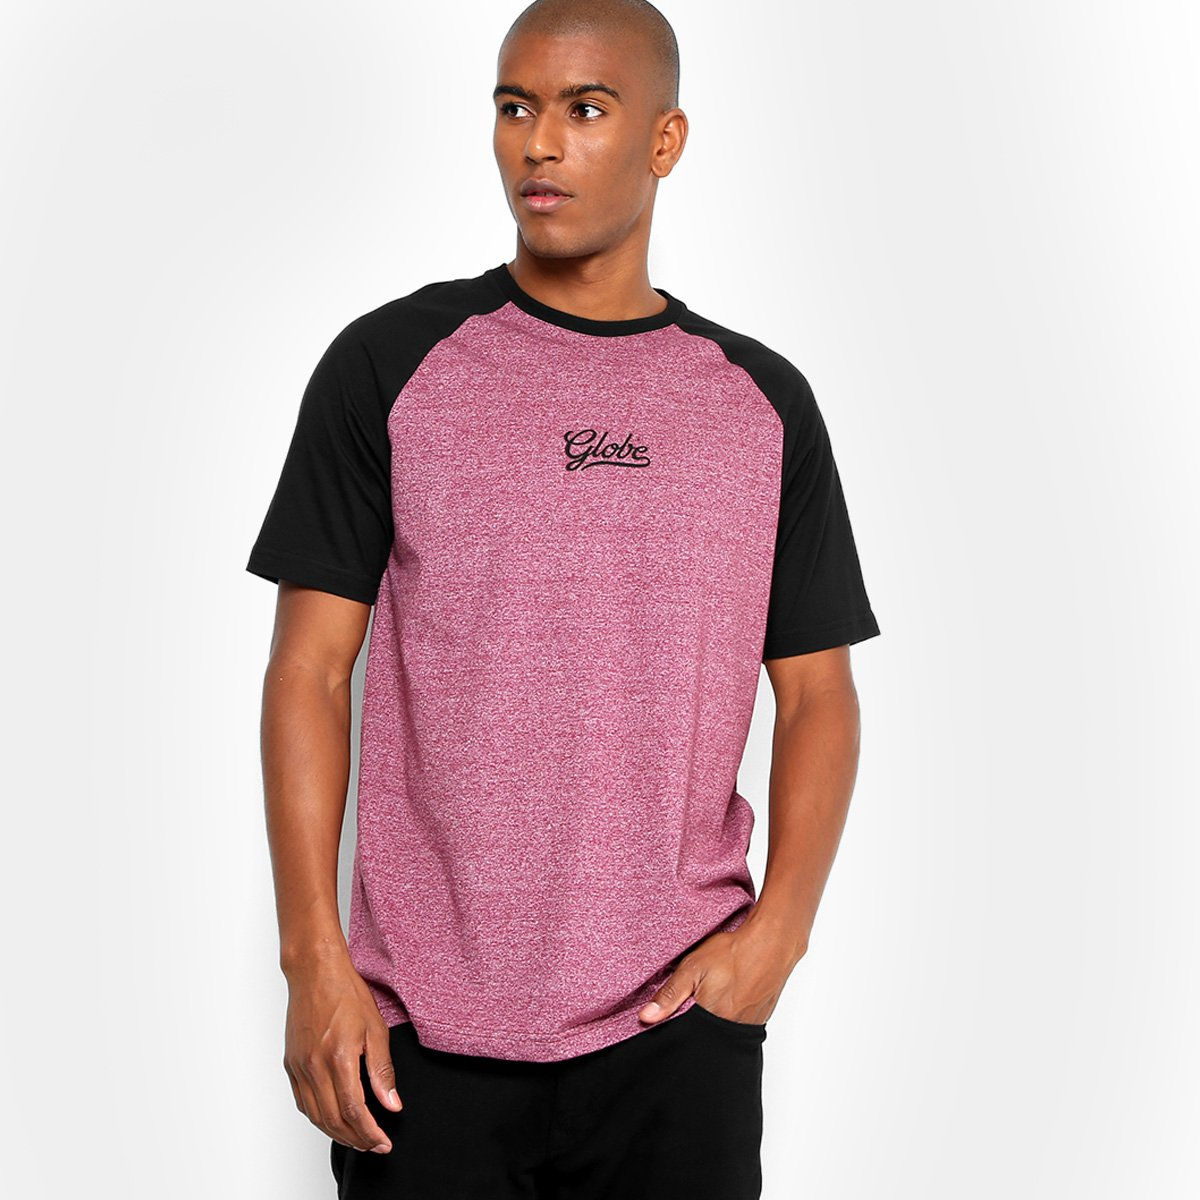 07ccf62b1 Camiseta Globe Especial Moline Masculina